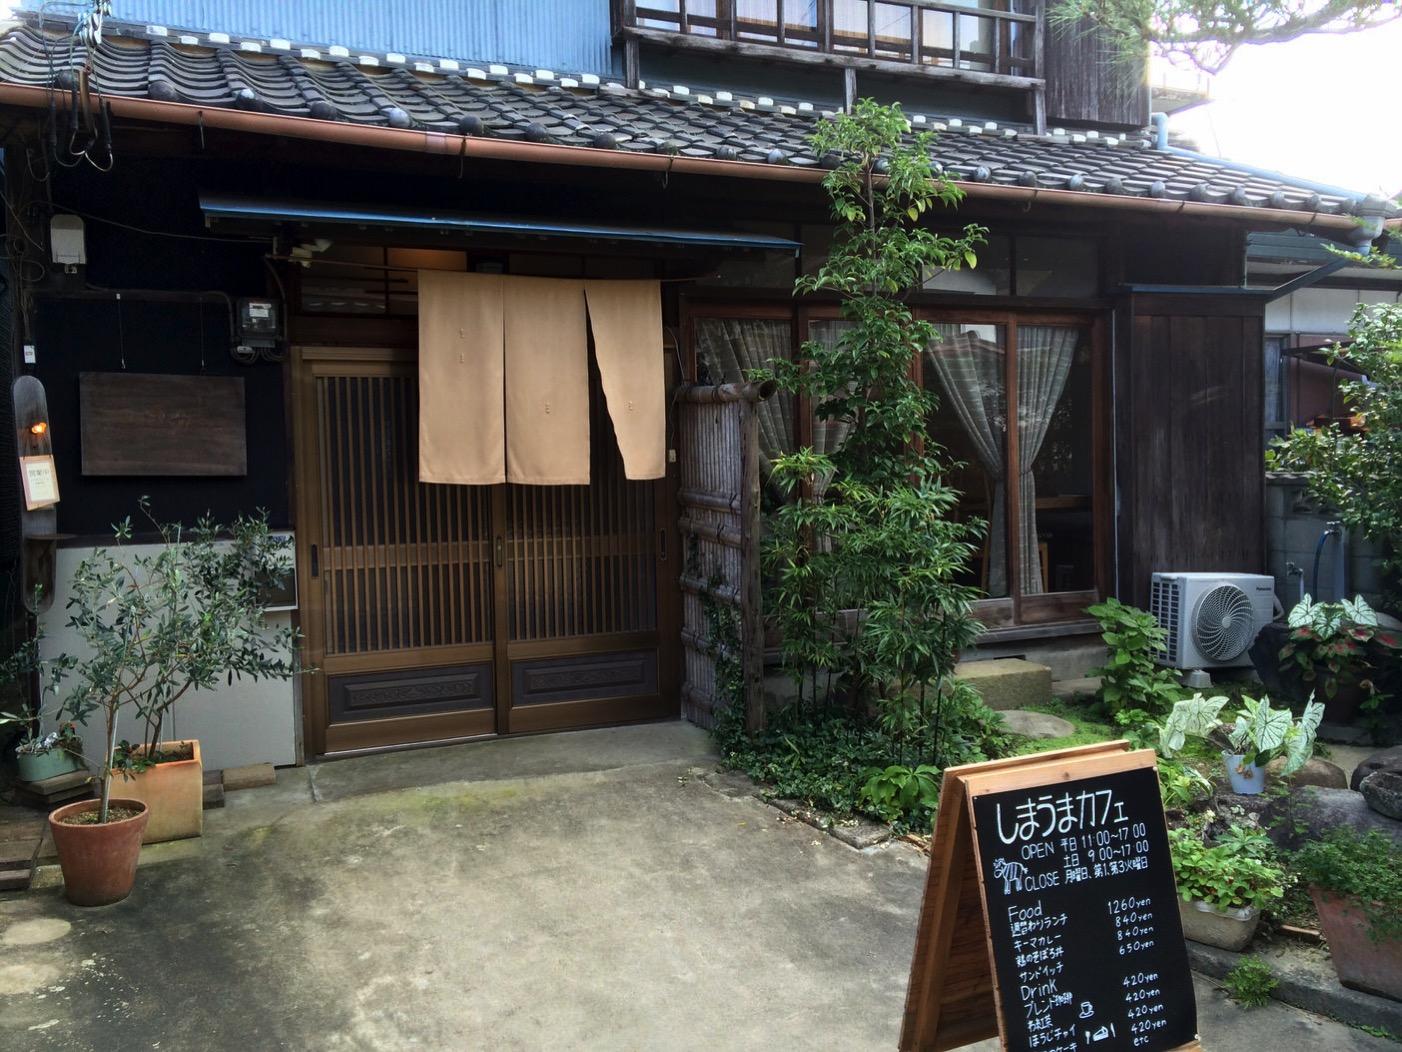 藤川 しまうまカフェ外観